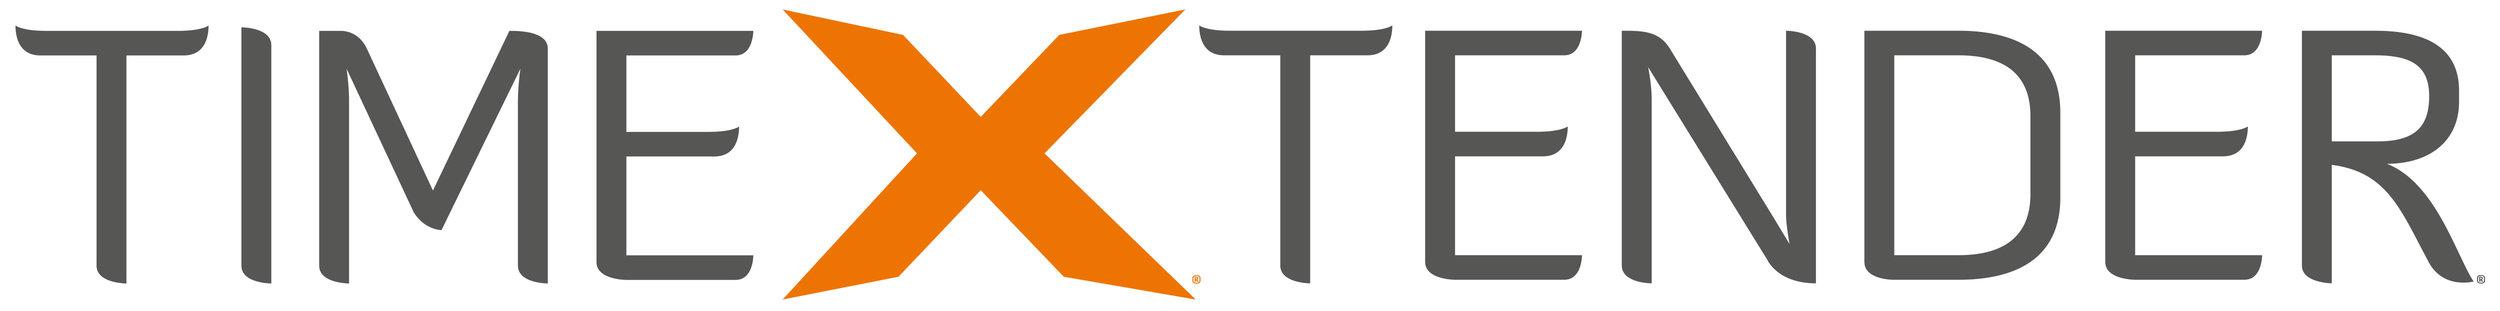 TimeXtender logo